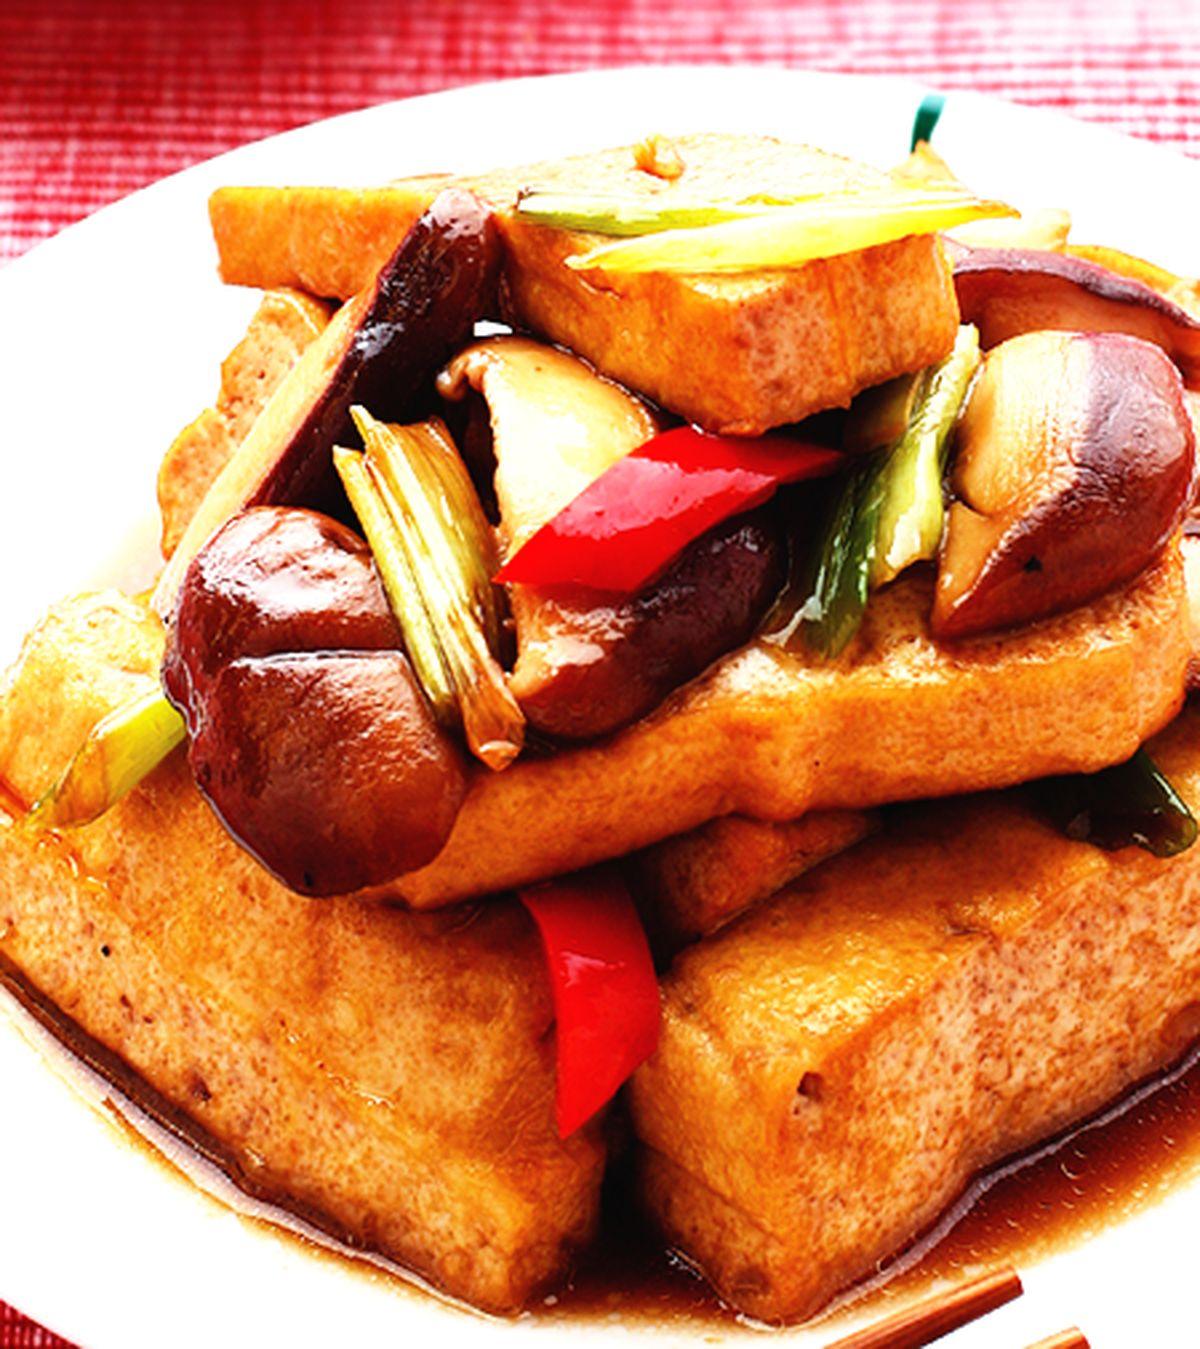 【食譜】紅燒臭豆腐:www.ytower.com.tw